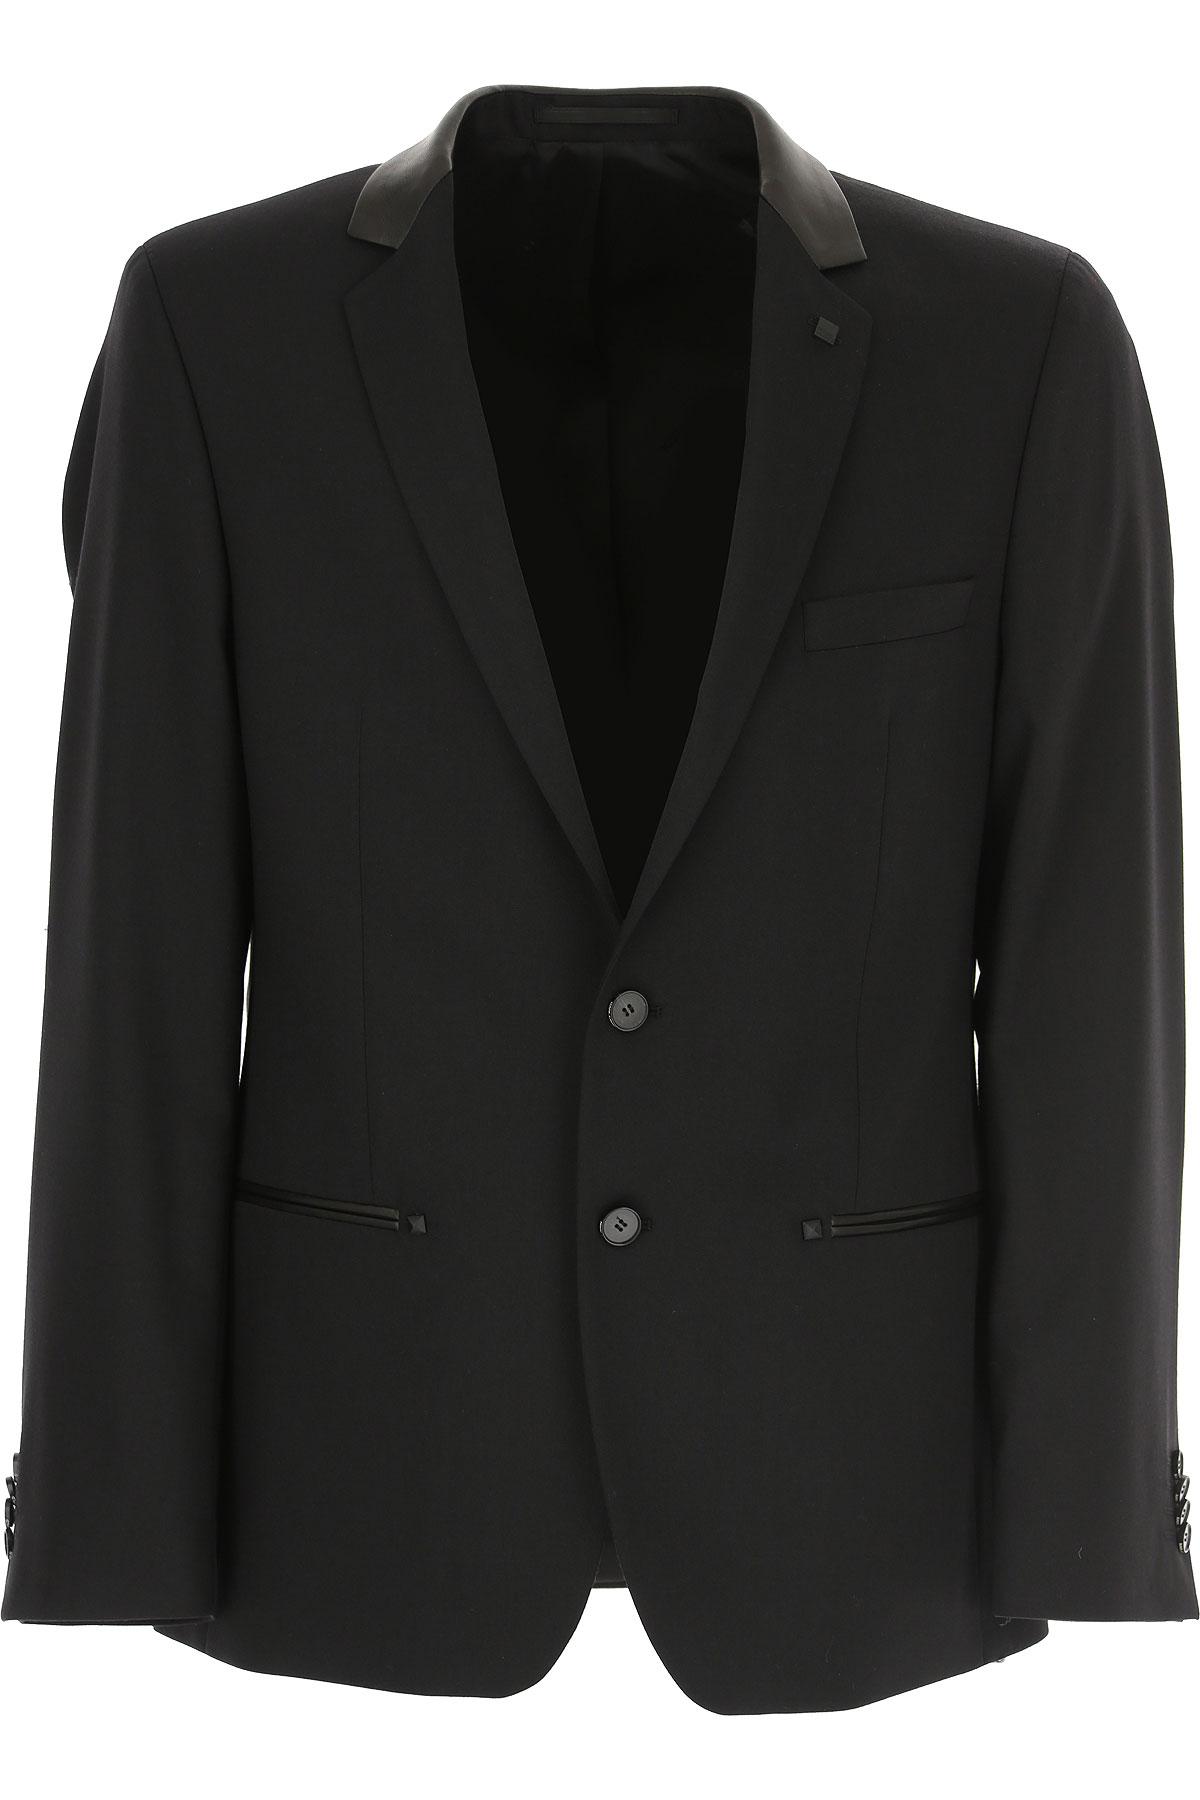 Karl Lagerfeld Blazer for Men, Sport Coat On Sale, Black, Wool, 2019, L M XL XXL